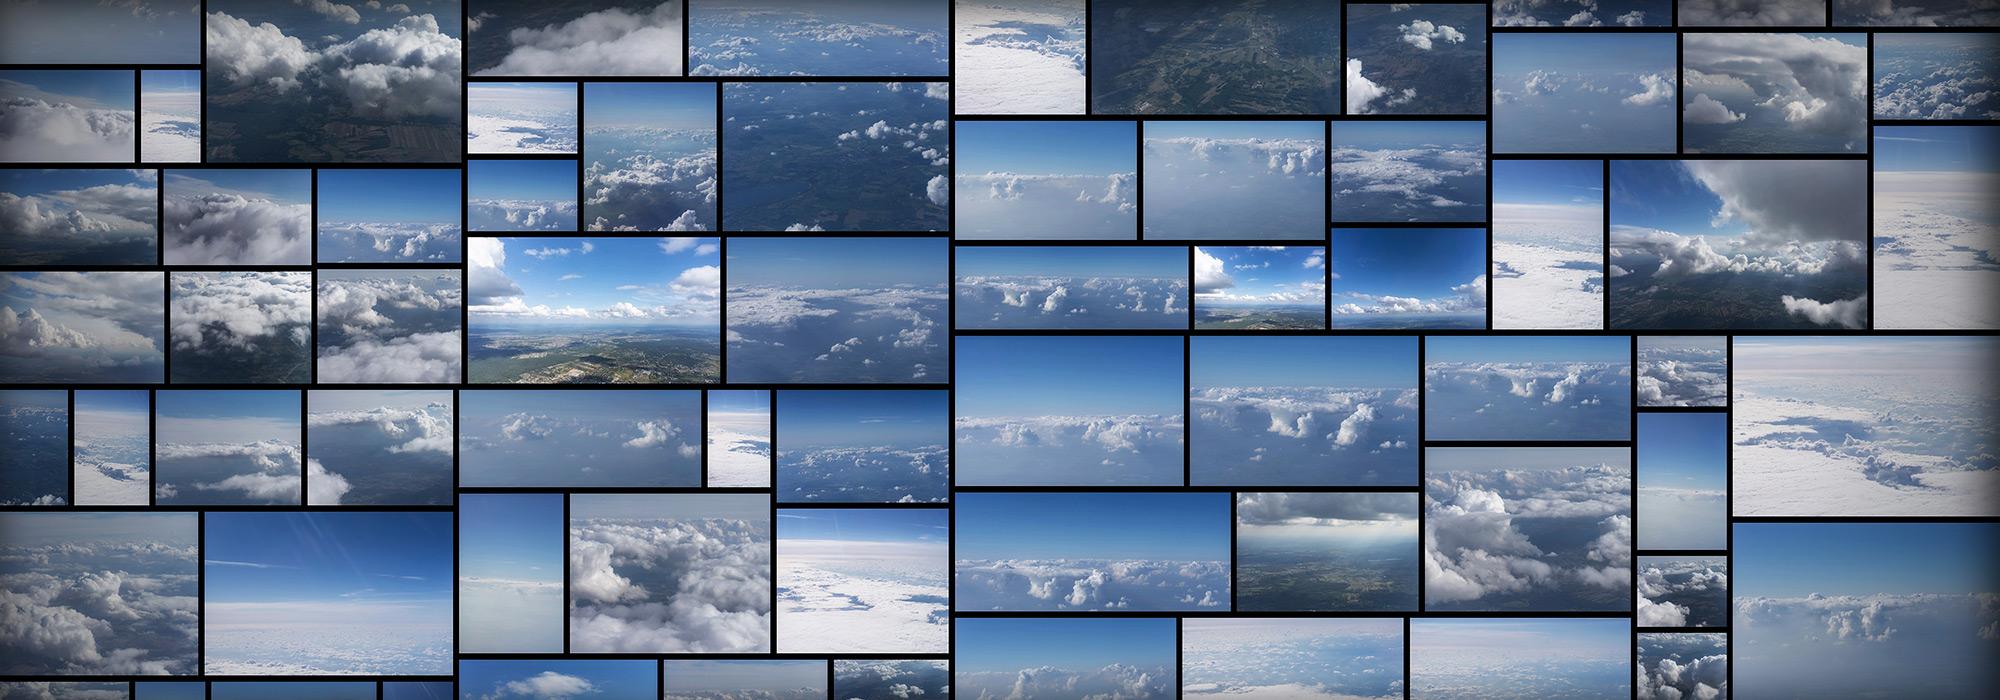 AerialSkiesCloudsHorizon